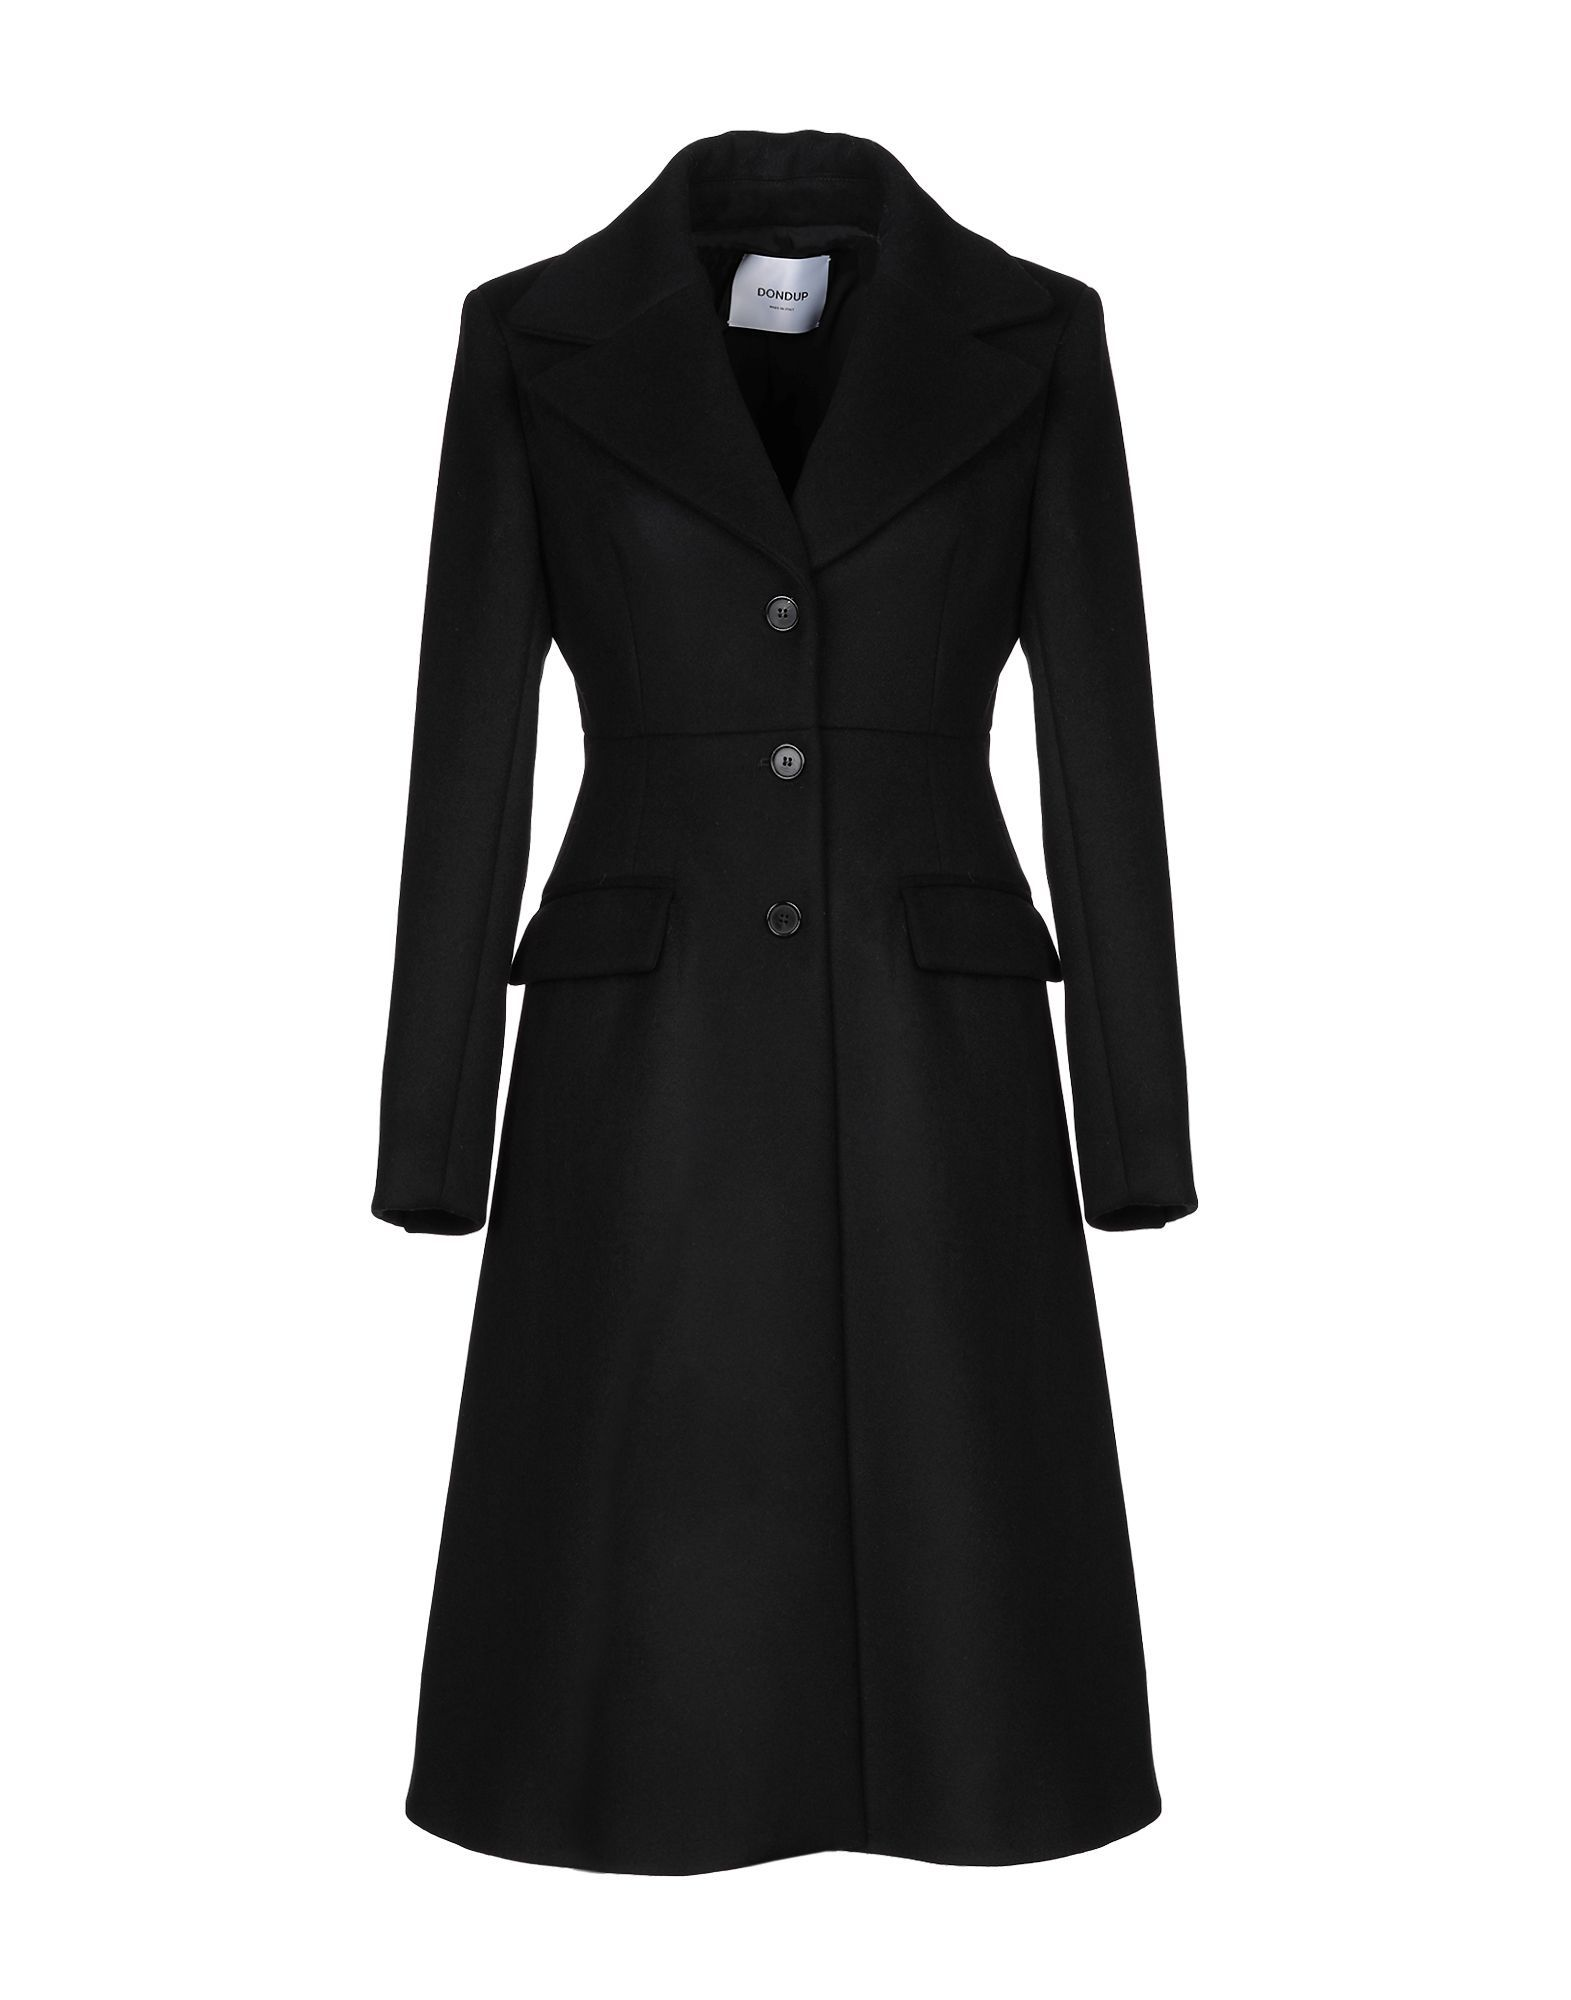 Dondup Black Virgin Wool Coat